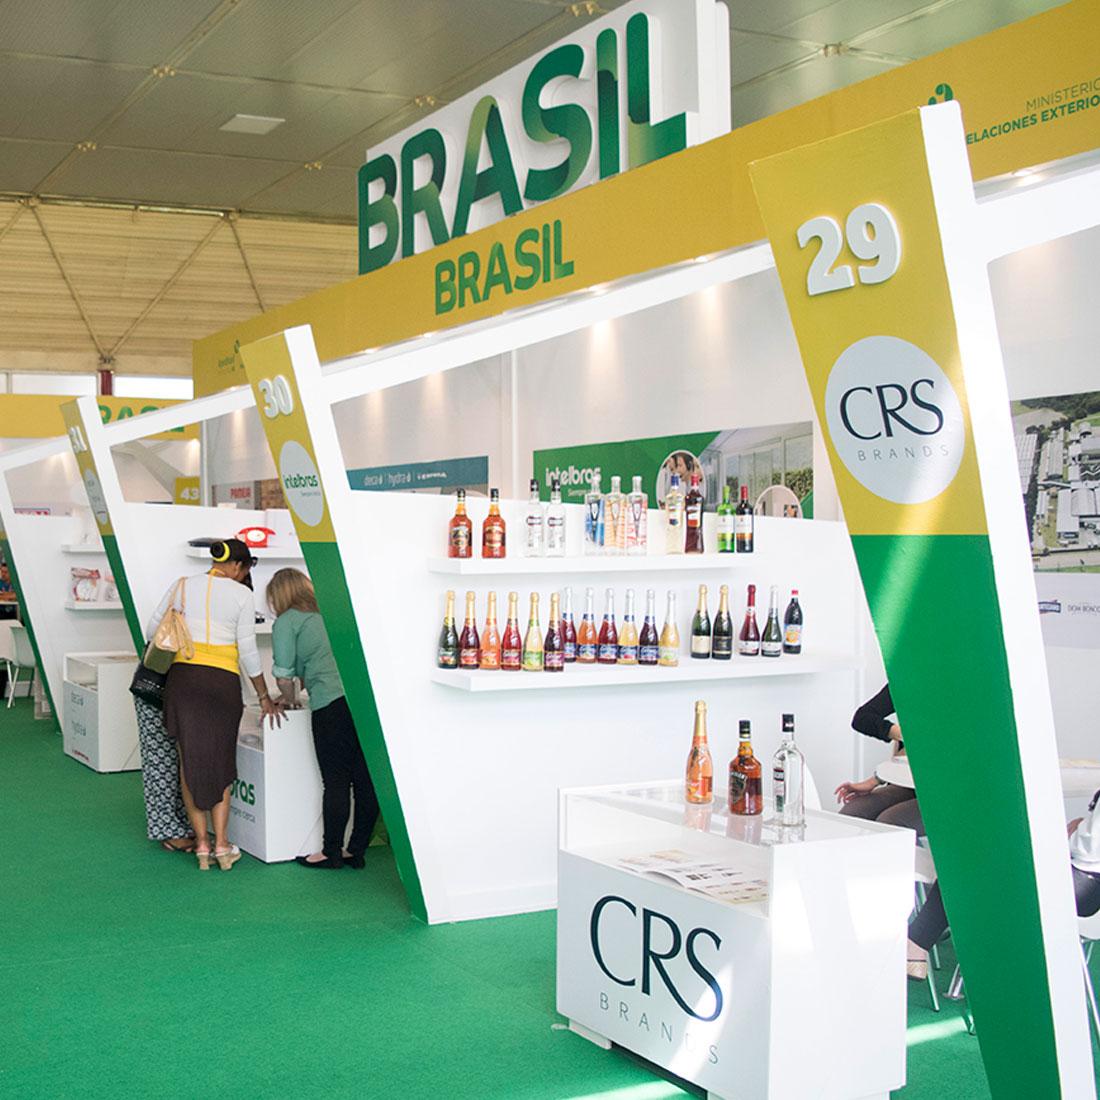 Diseño y montaje de stands para Brasil CRS Brands